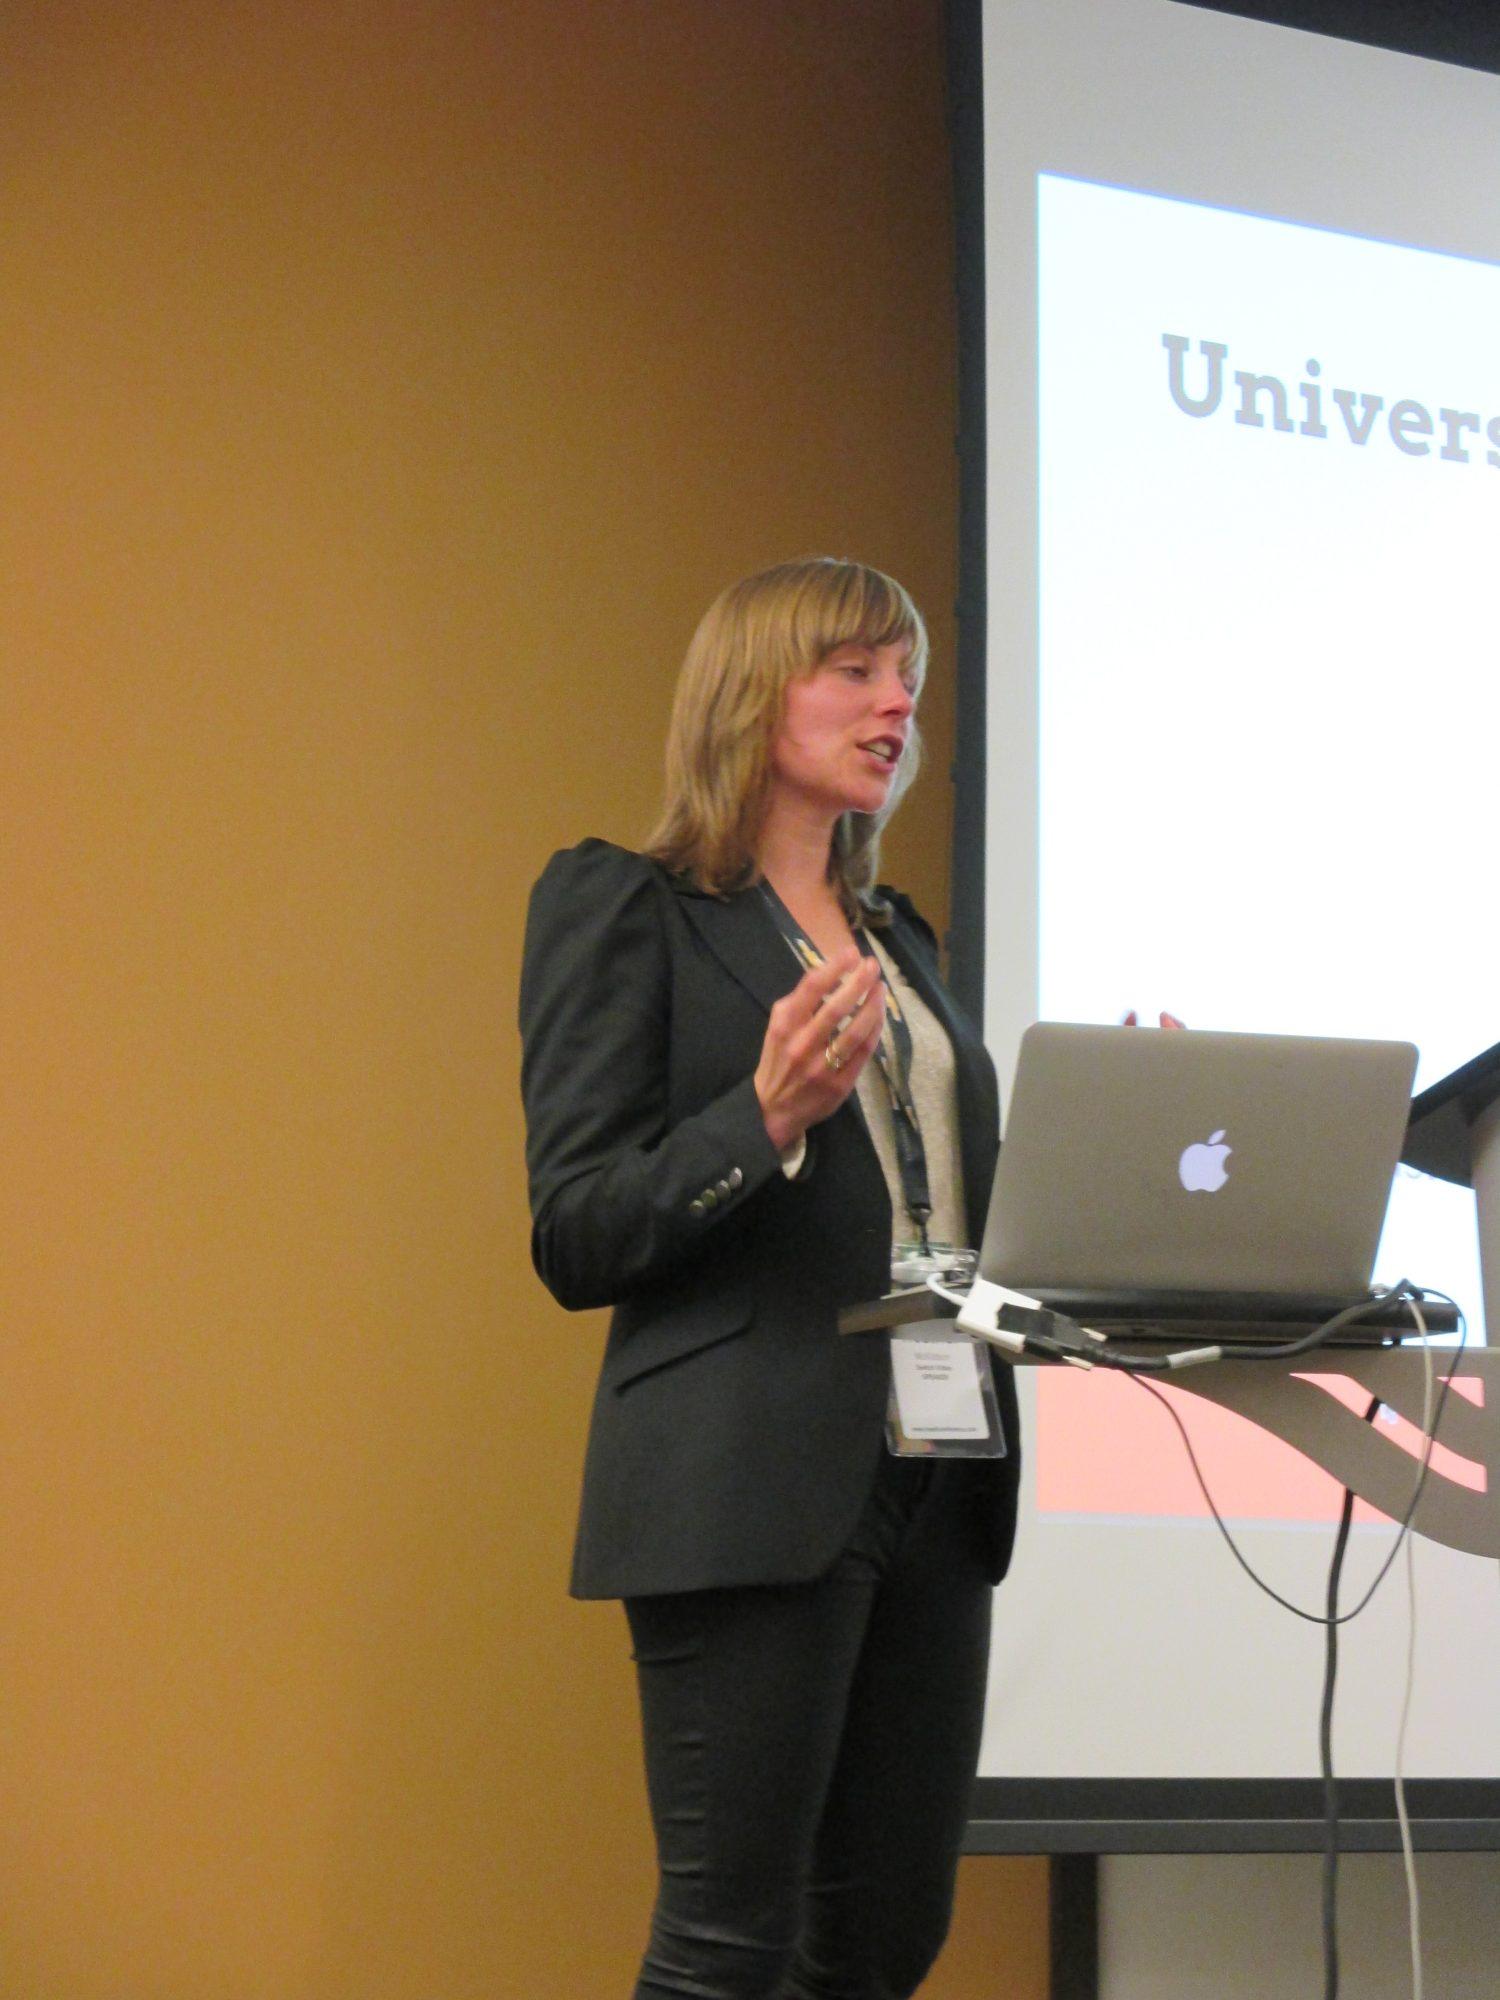 Heather McKibbon of Switch Video